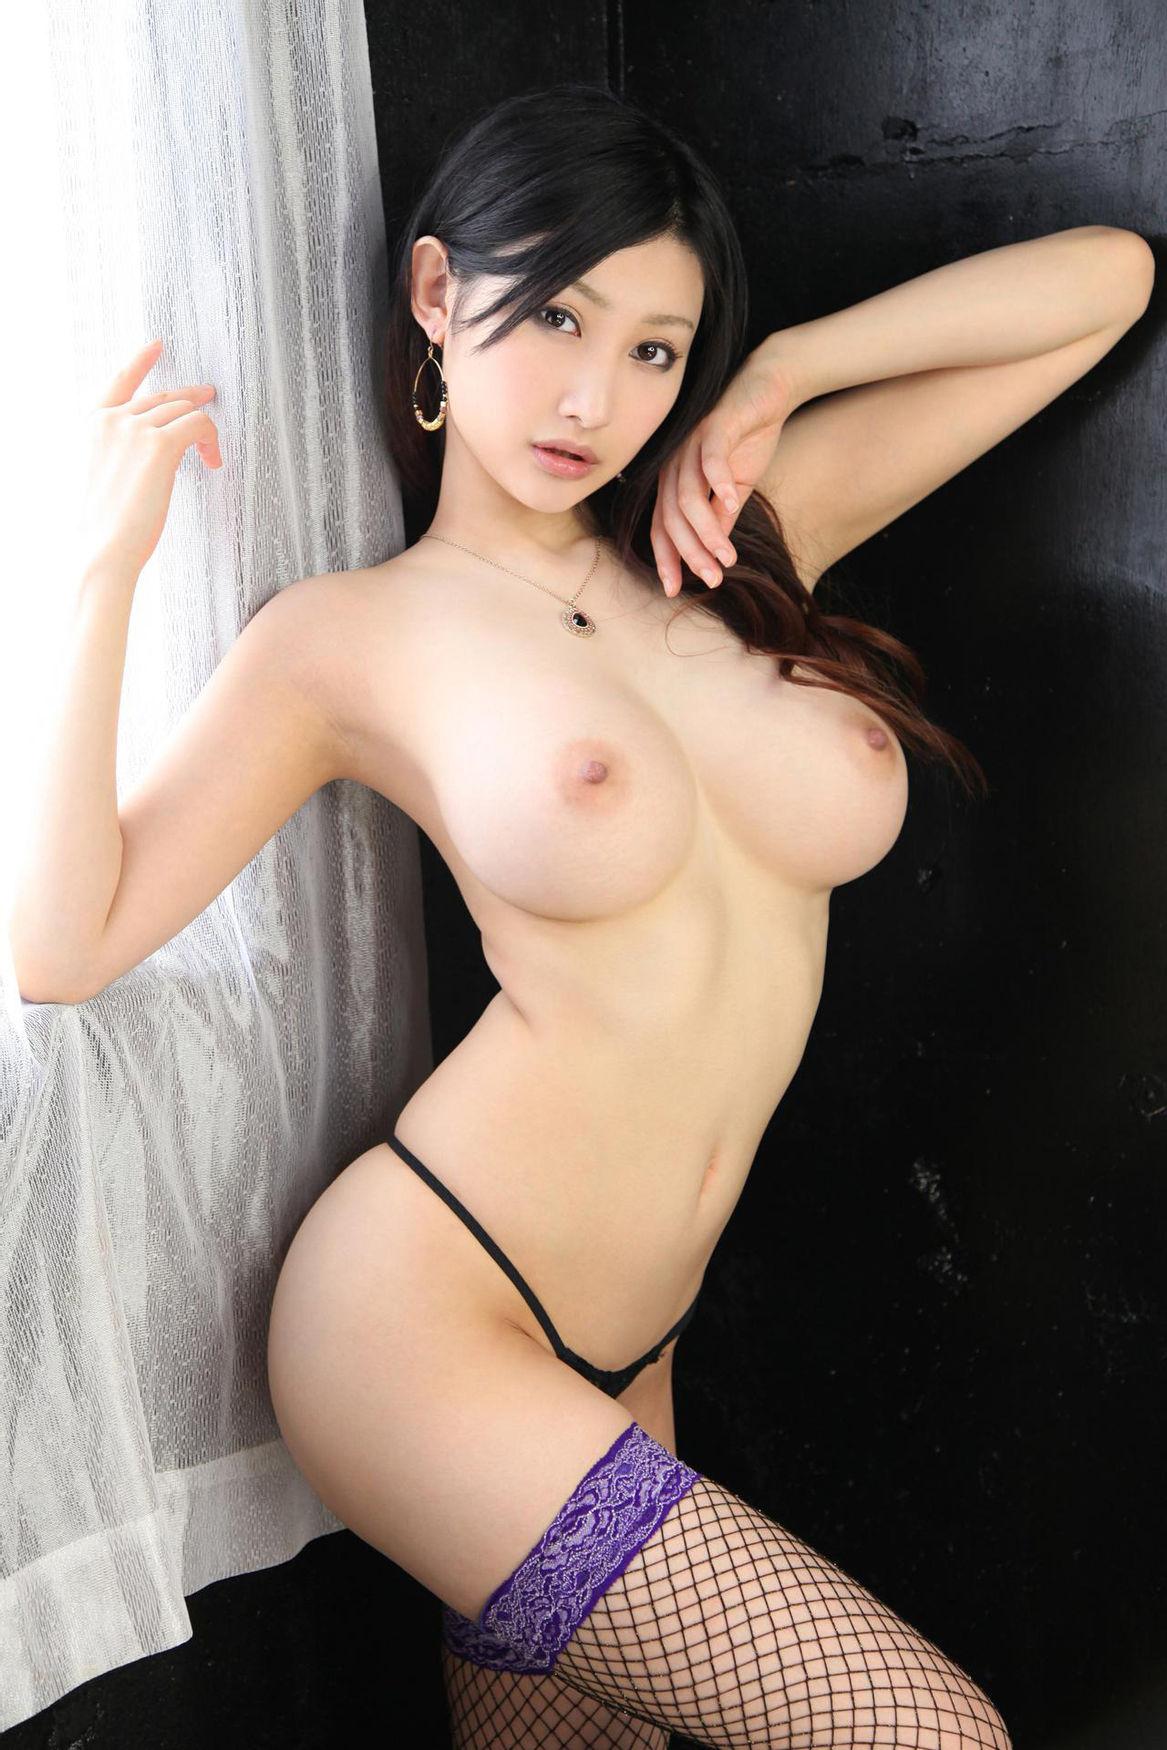 Sensual erotic asian topless thin woman stock photo